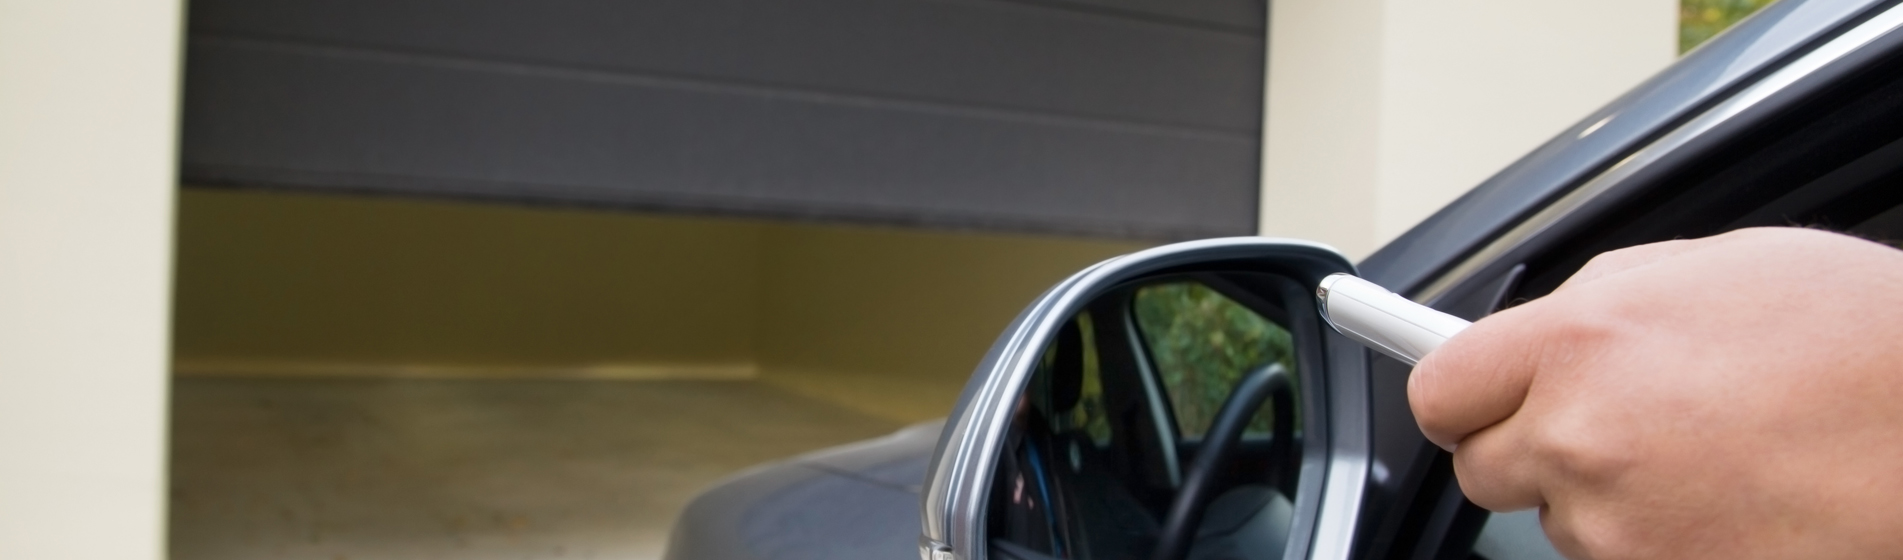 installer porte de garage sur-mesure 84 Vaucluse